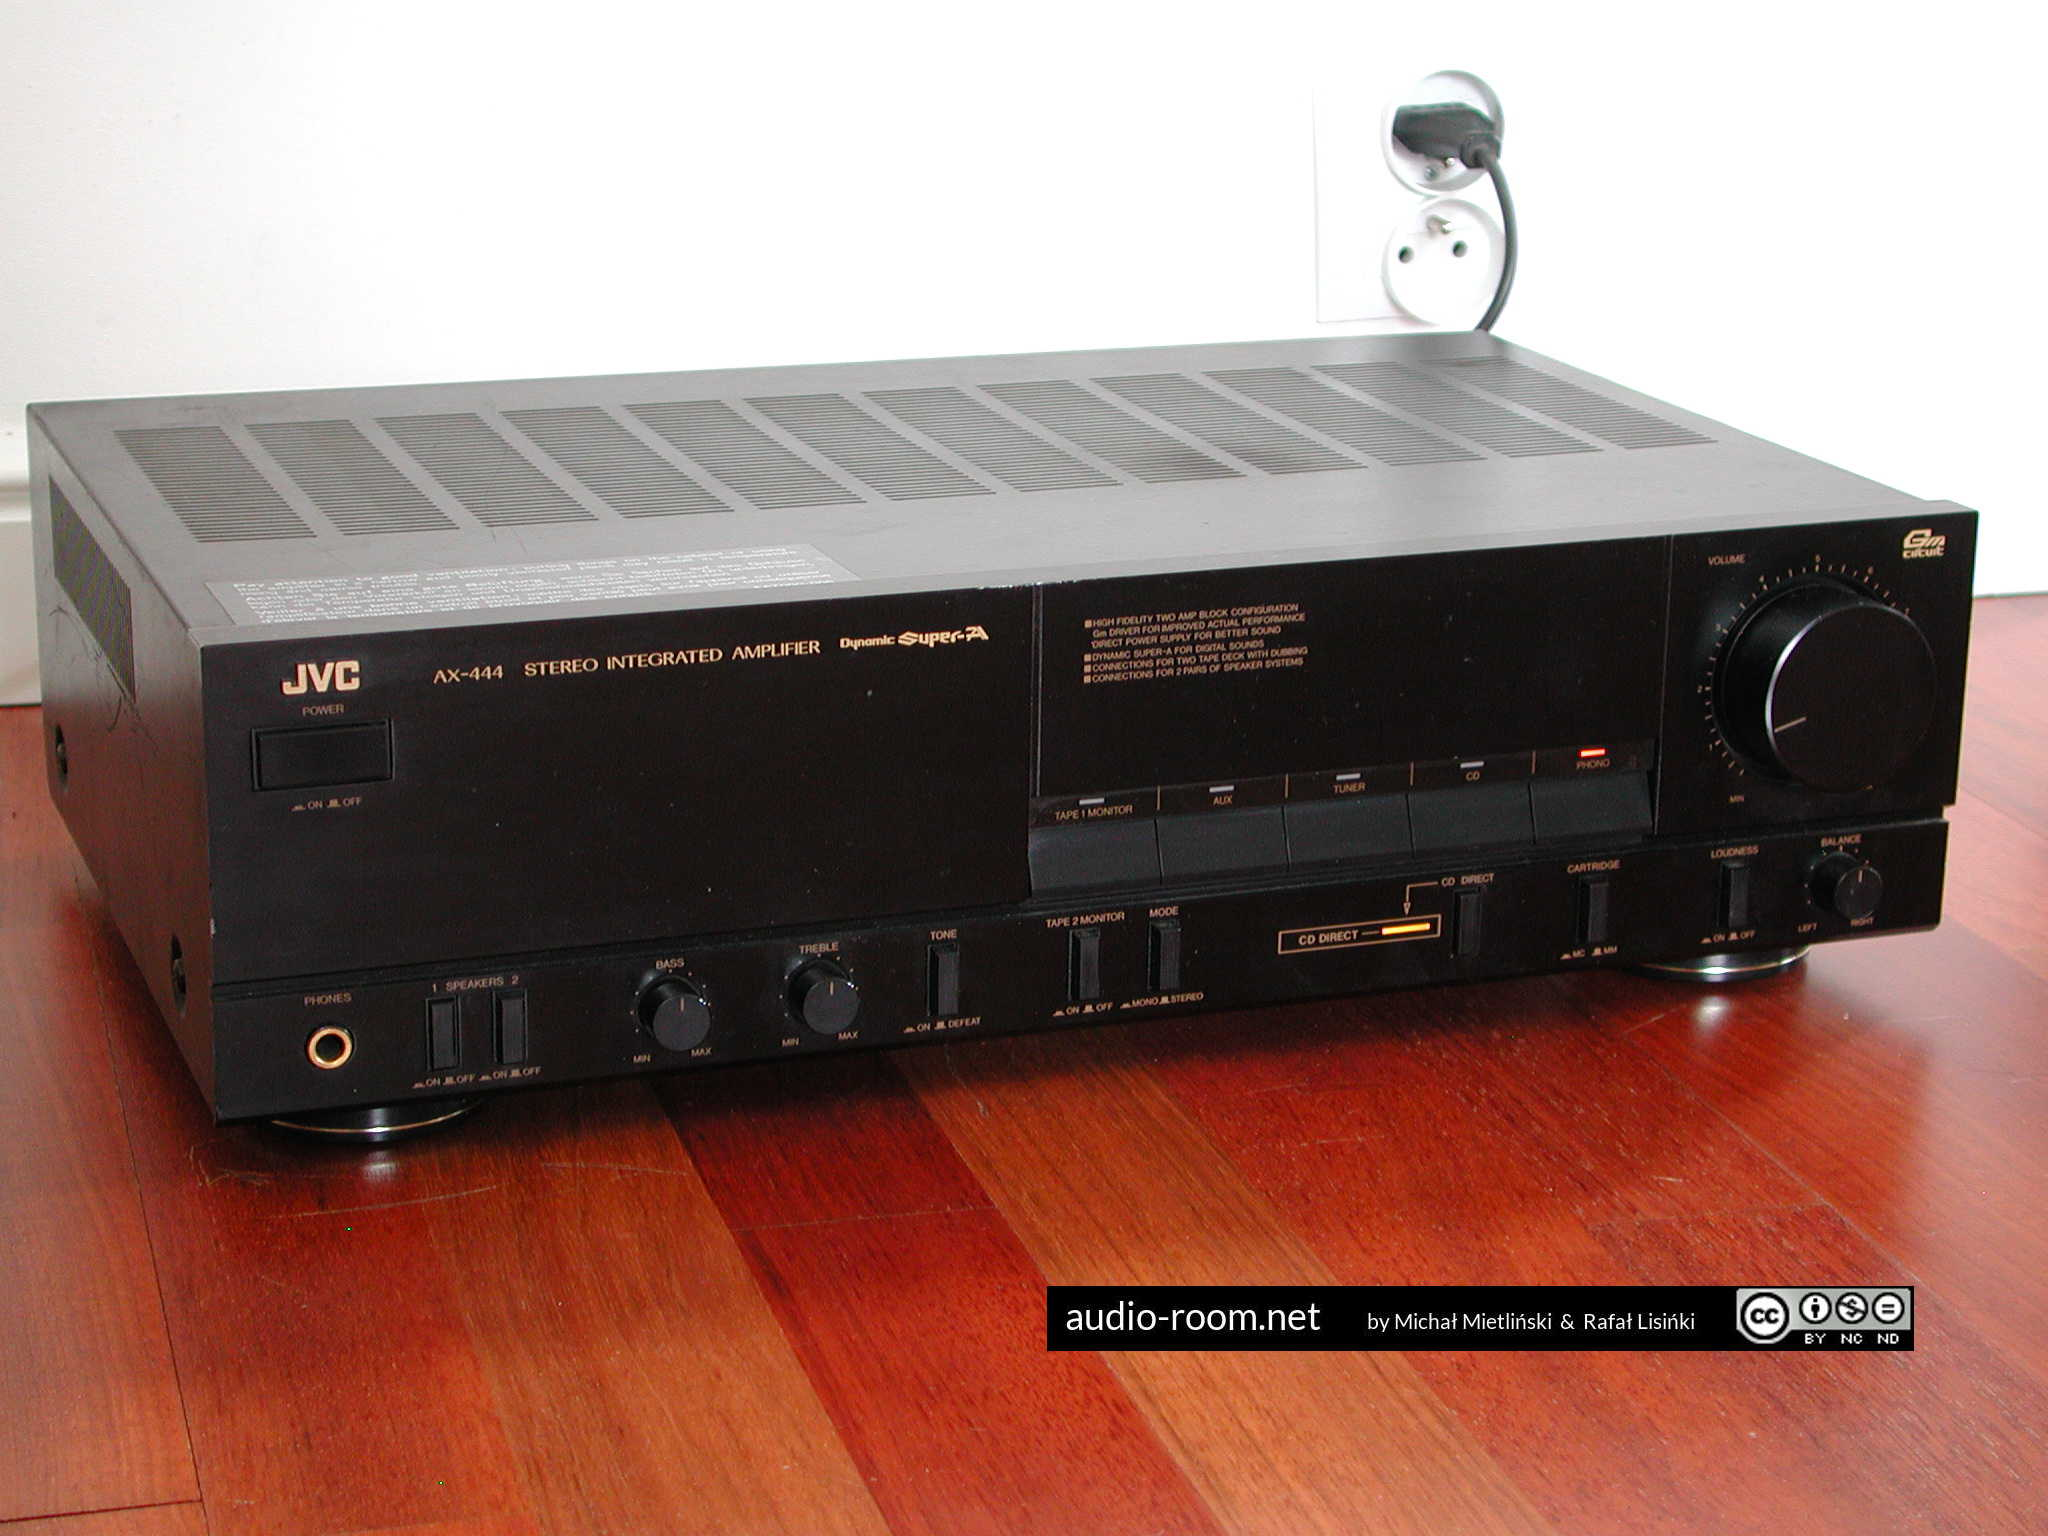 jvc-ax-444-dscn9508